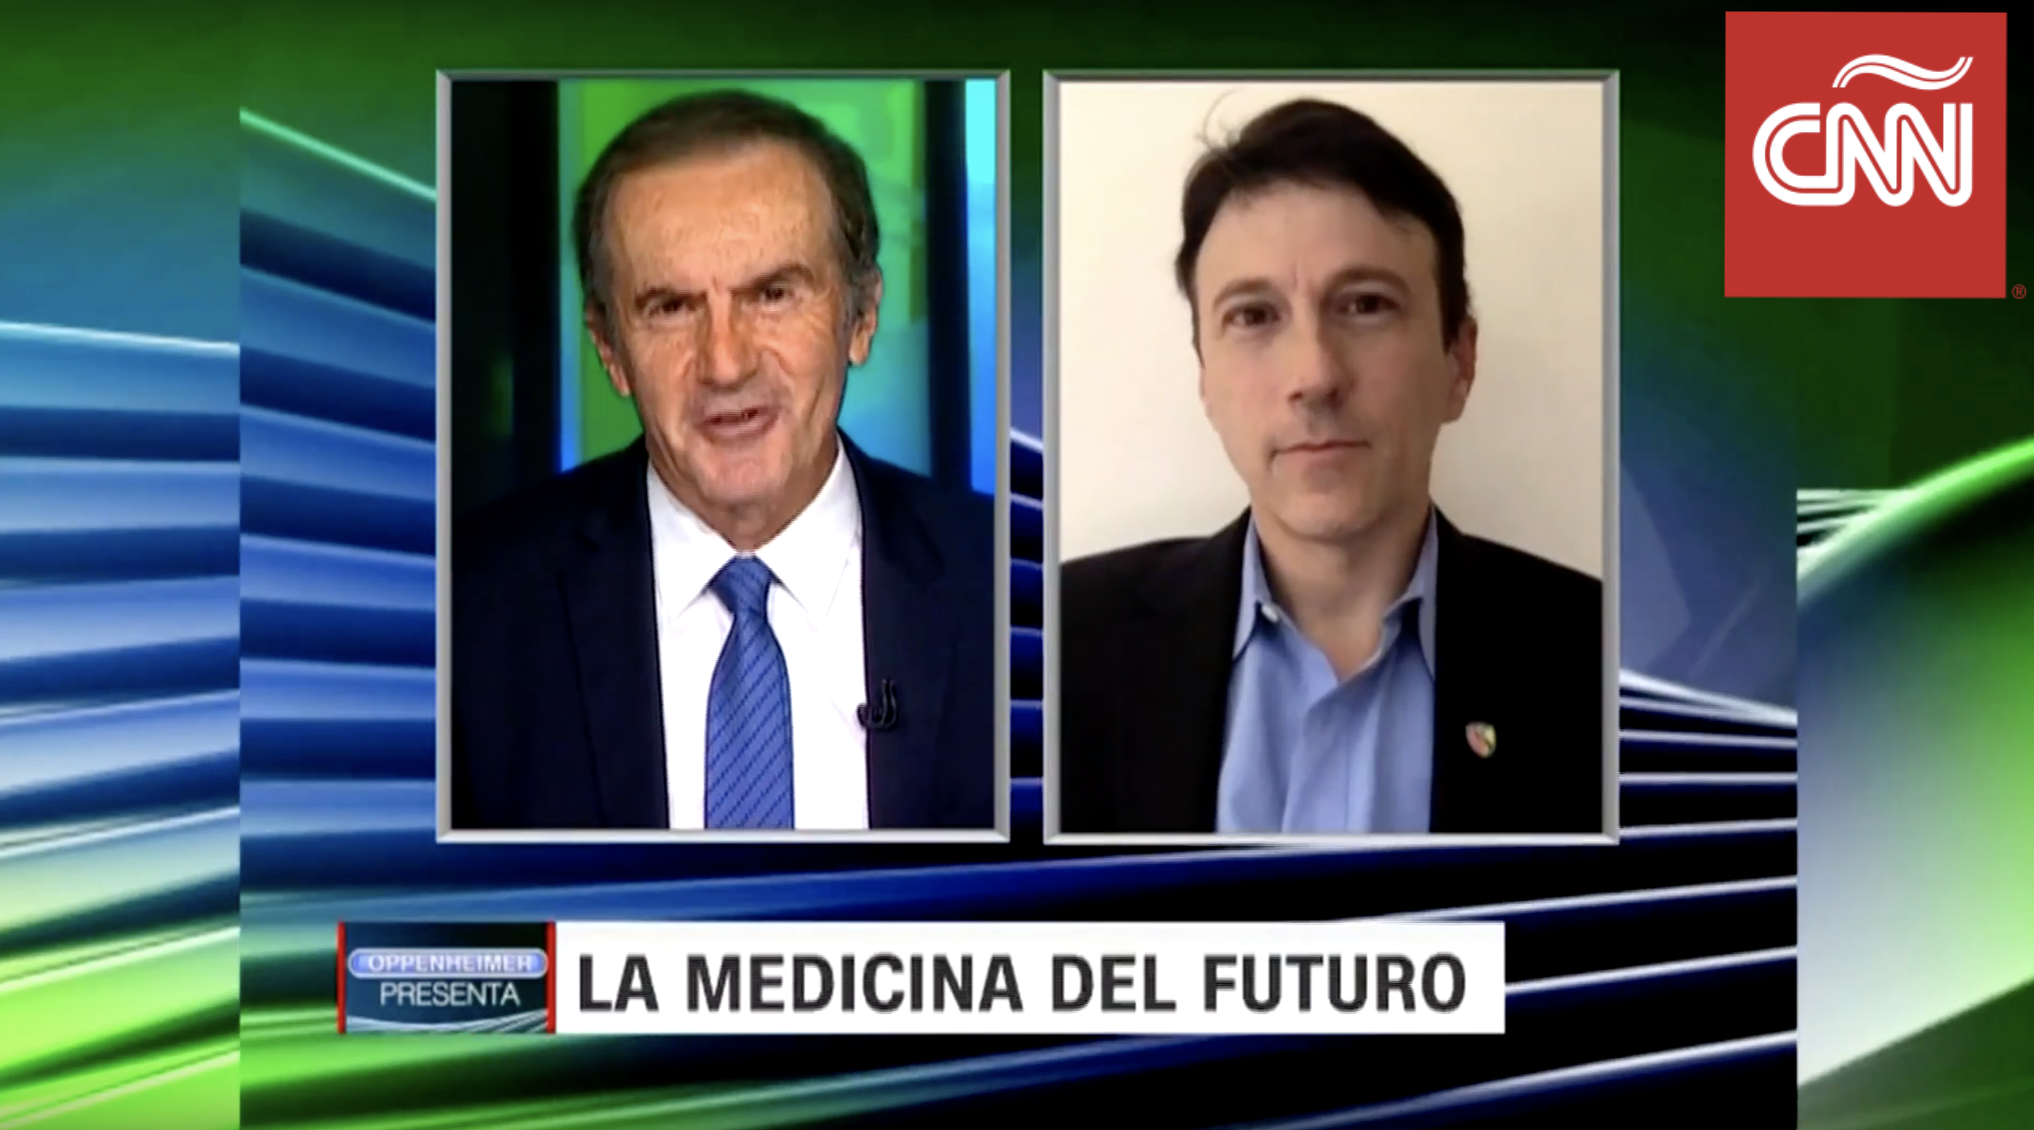 CNN Espanol - Future of Medicine